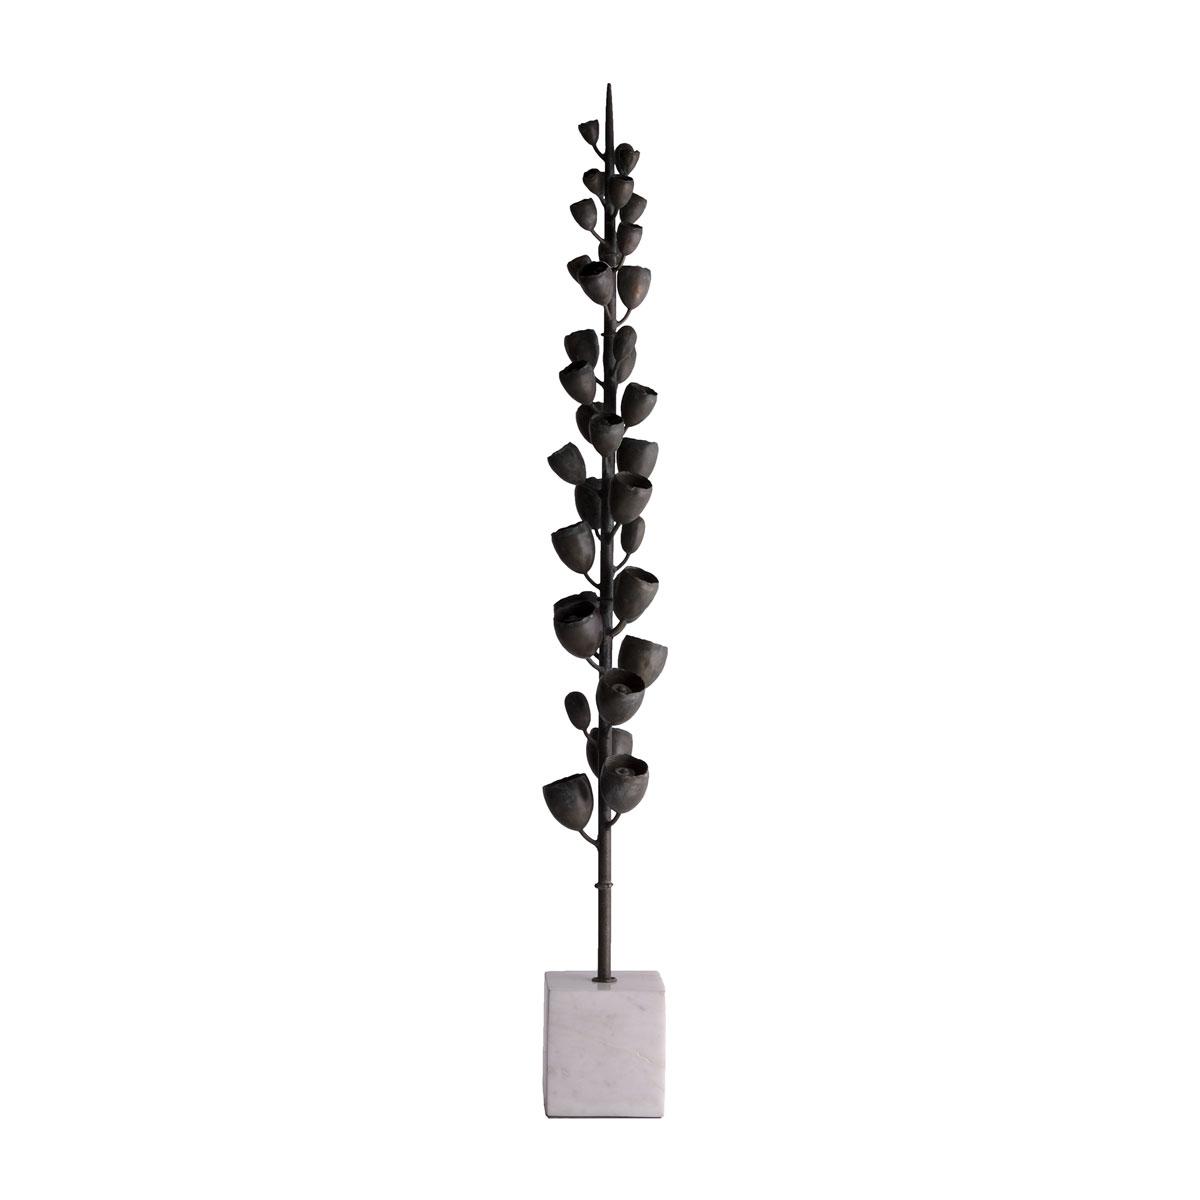 Michael Aram Eucalyptus Pod Sculpture, Limited Edition